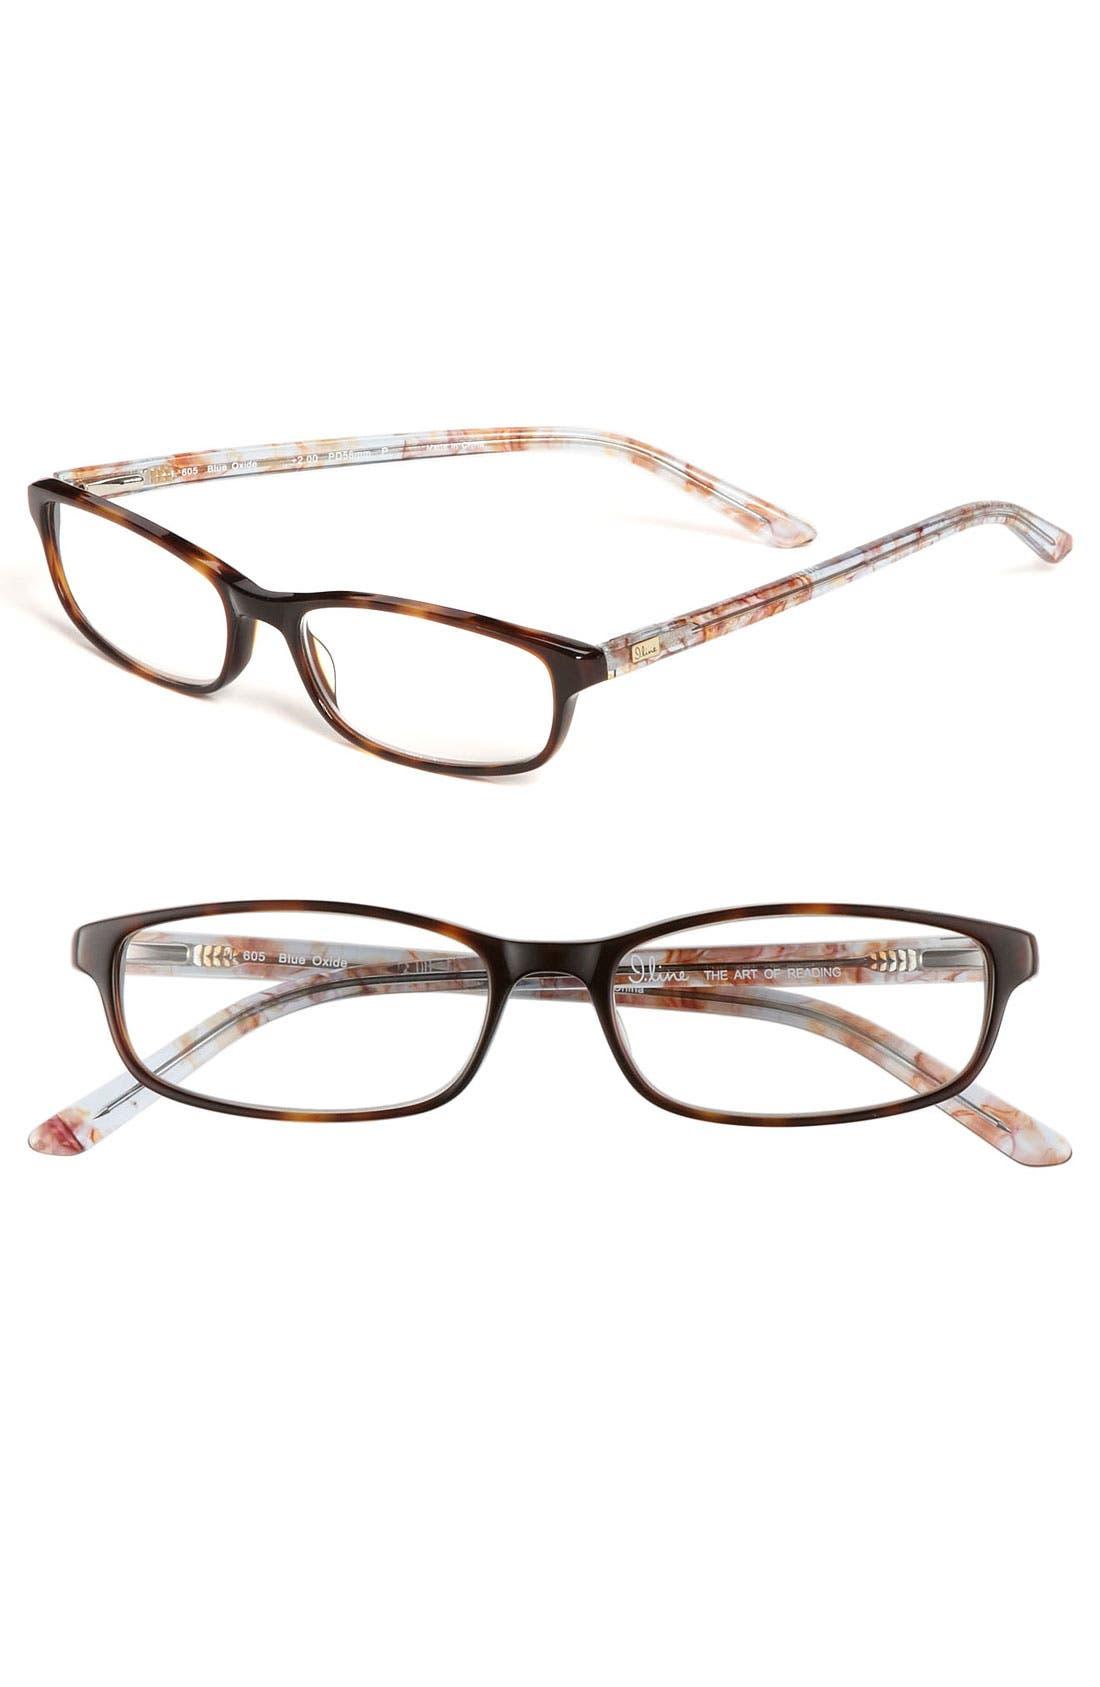 Alternate Image 1 Selected - I Line Eyewear 'Blue Oxide' Reading Glasses